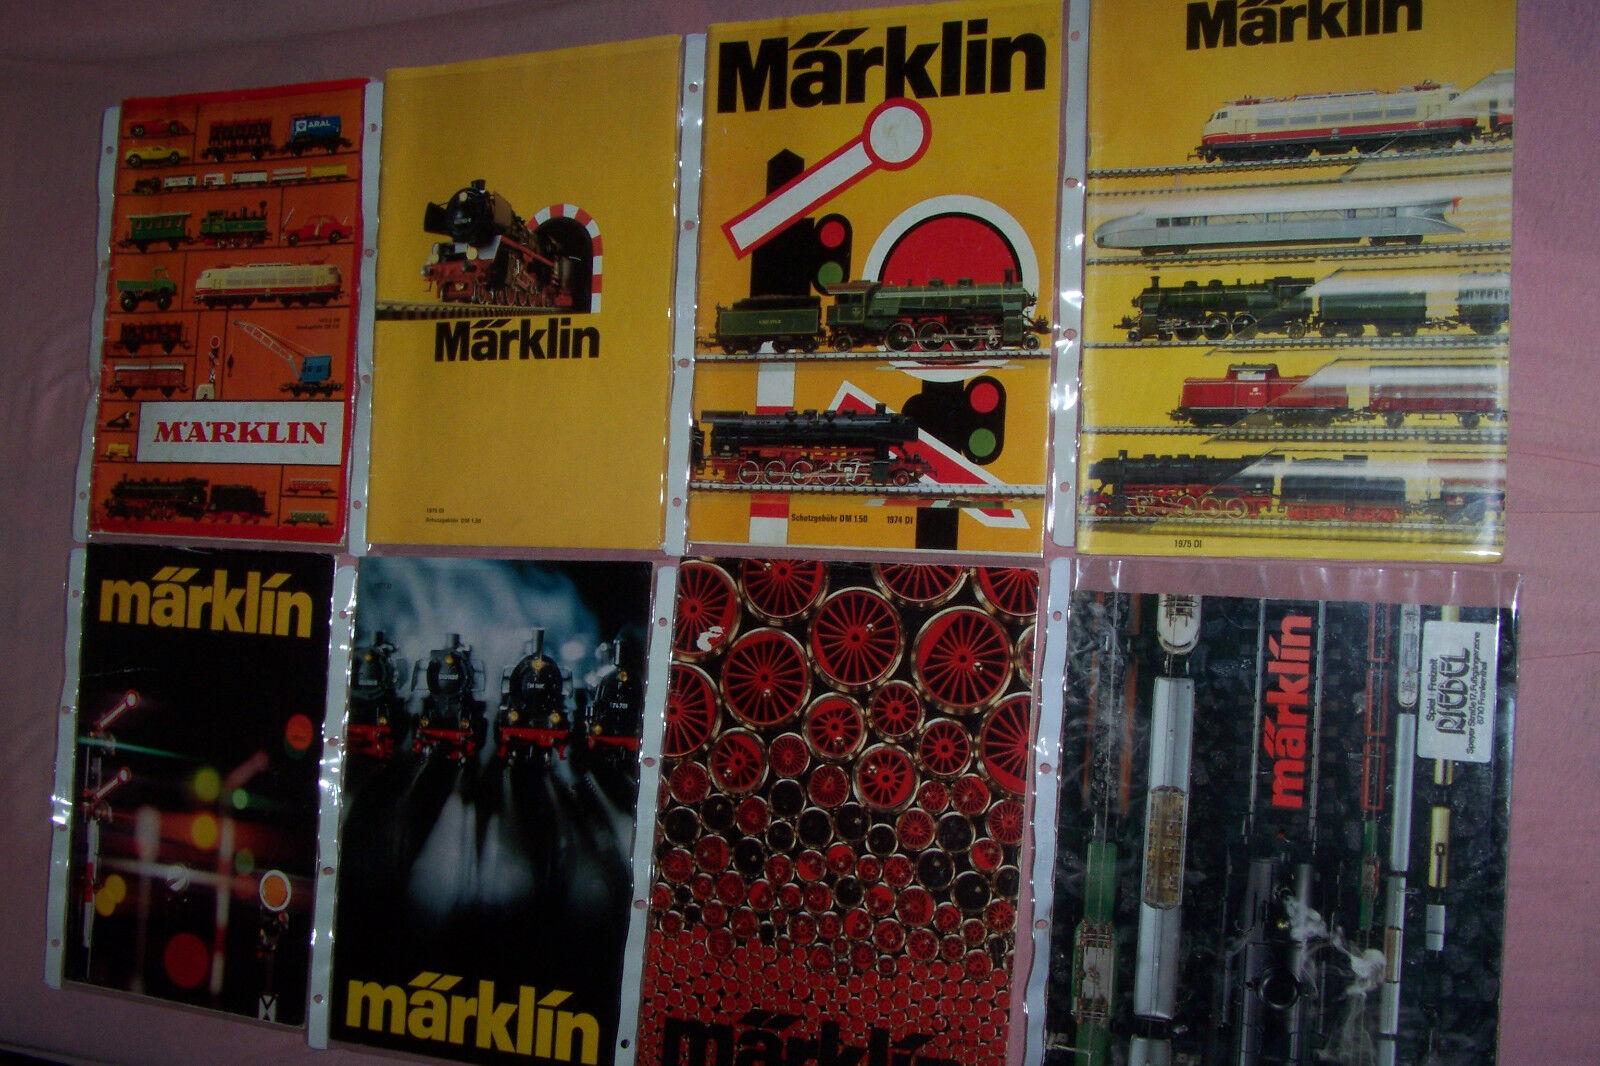 Märklin cataloghi Raccolta lot 1972 1973 1974 1975 1976 1977 1978 1979 listino prezzi